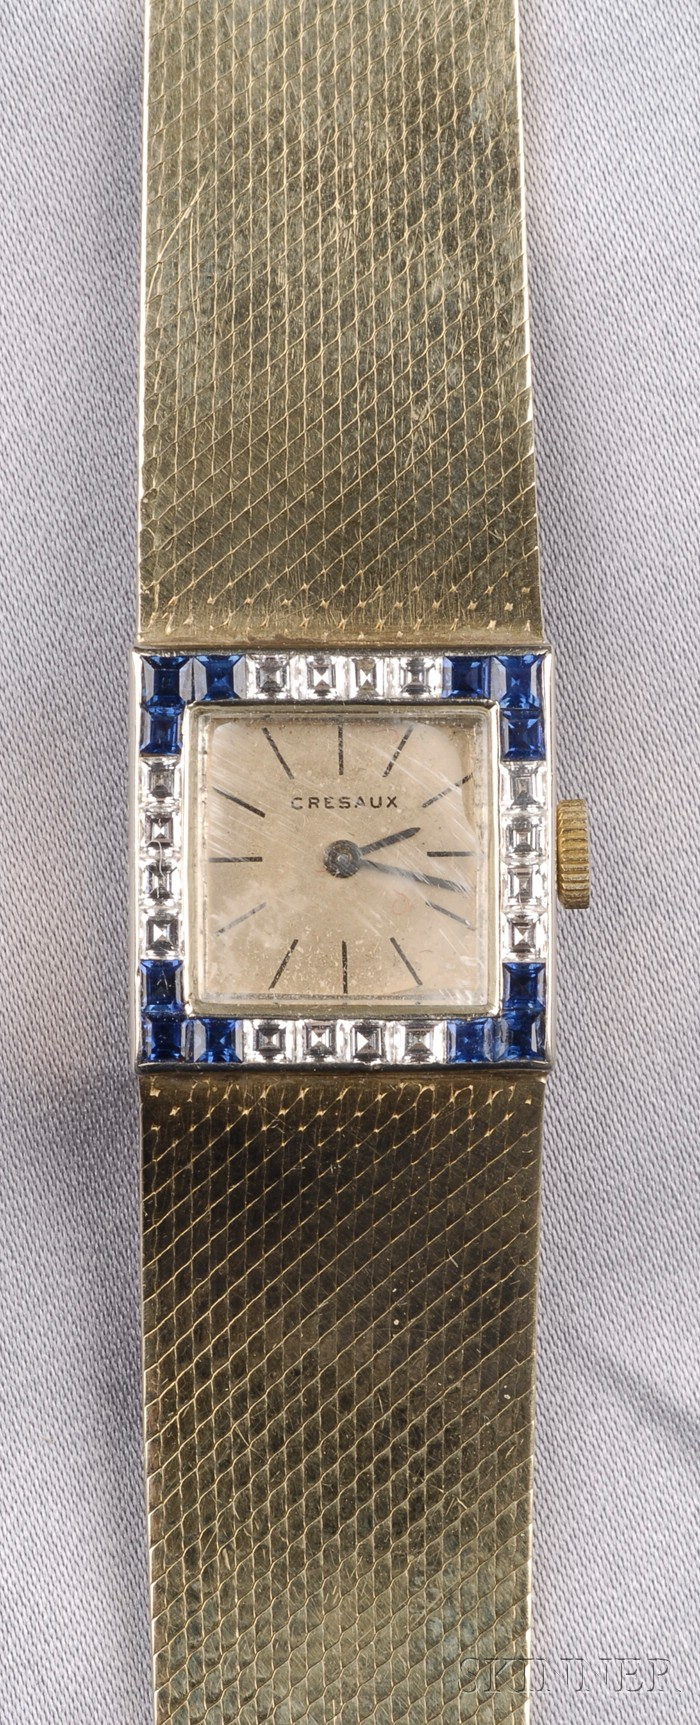 14kt Gold Gem-set Wristwatch, Cresaux